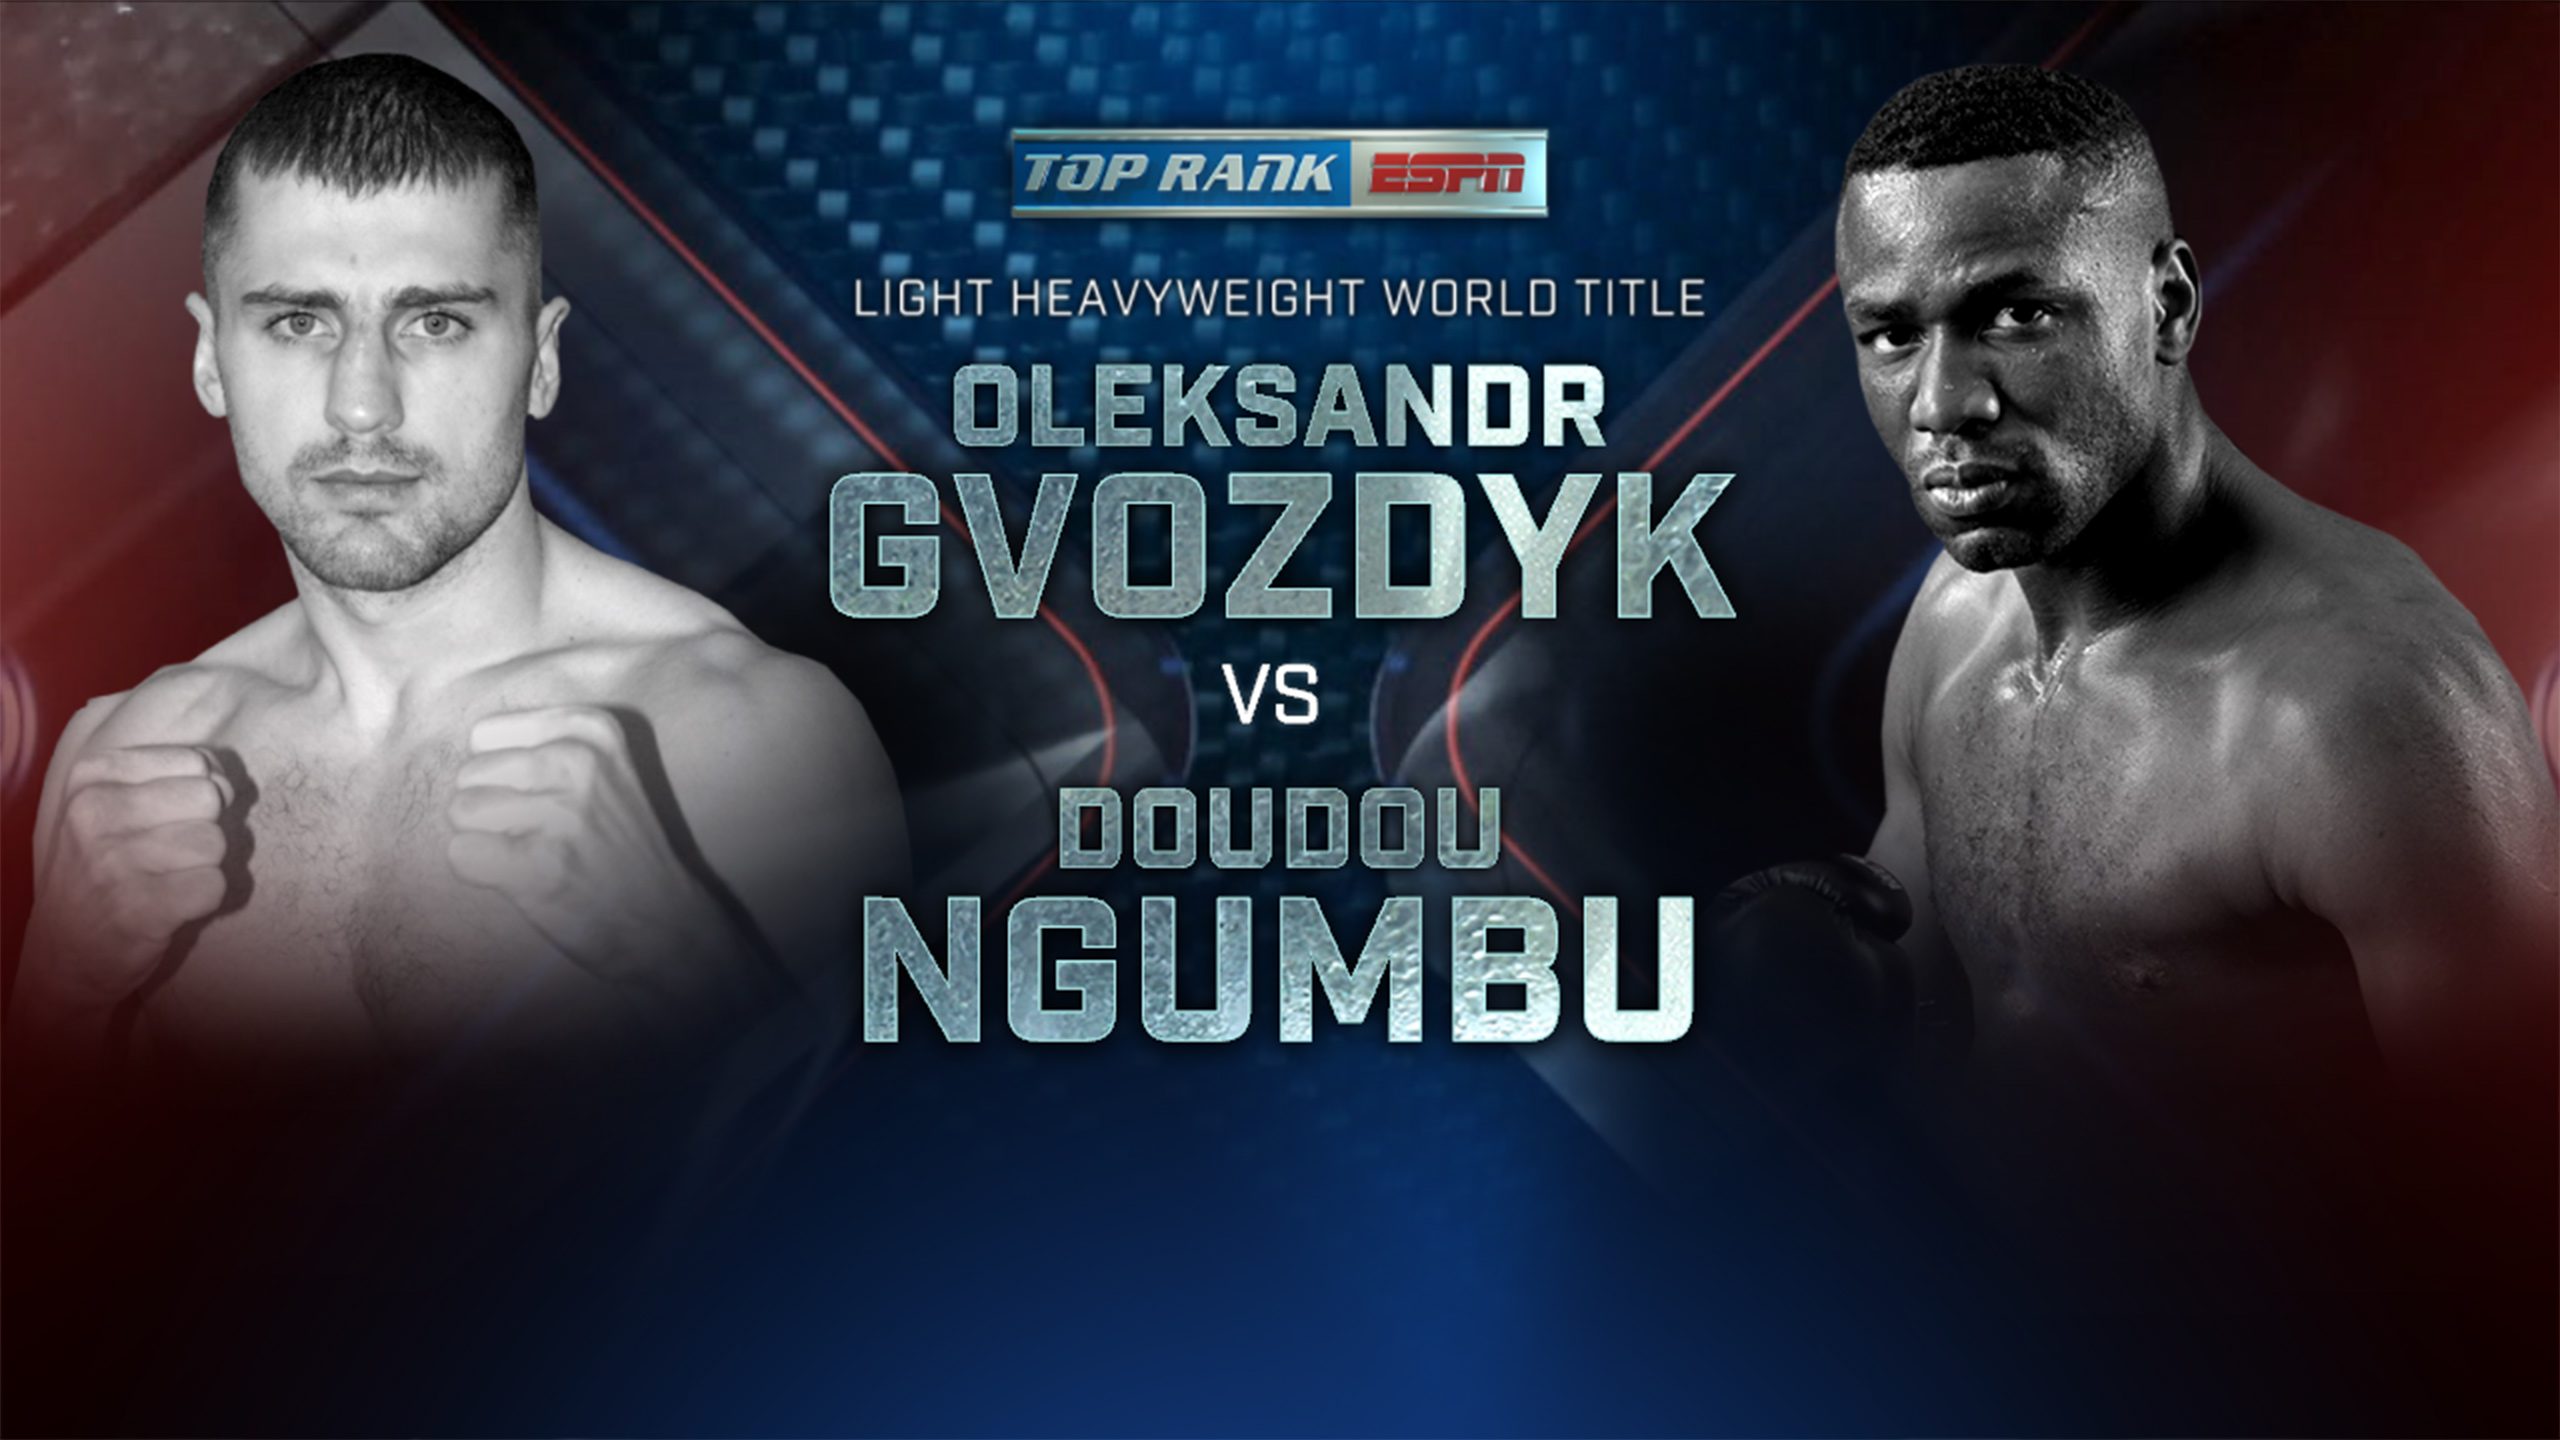 Oleksandr Gvozdyk vs. Doudou Ngumbu